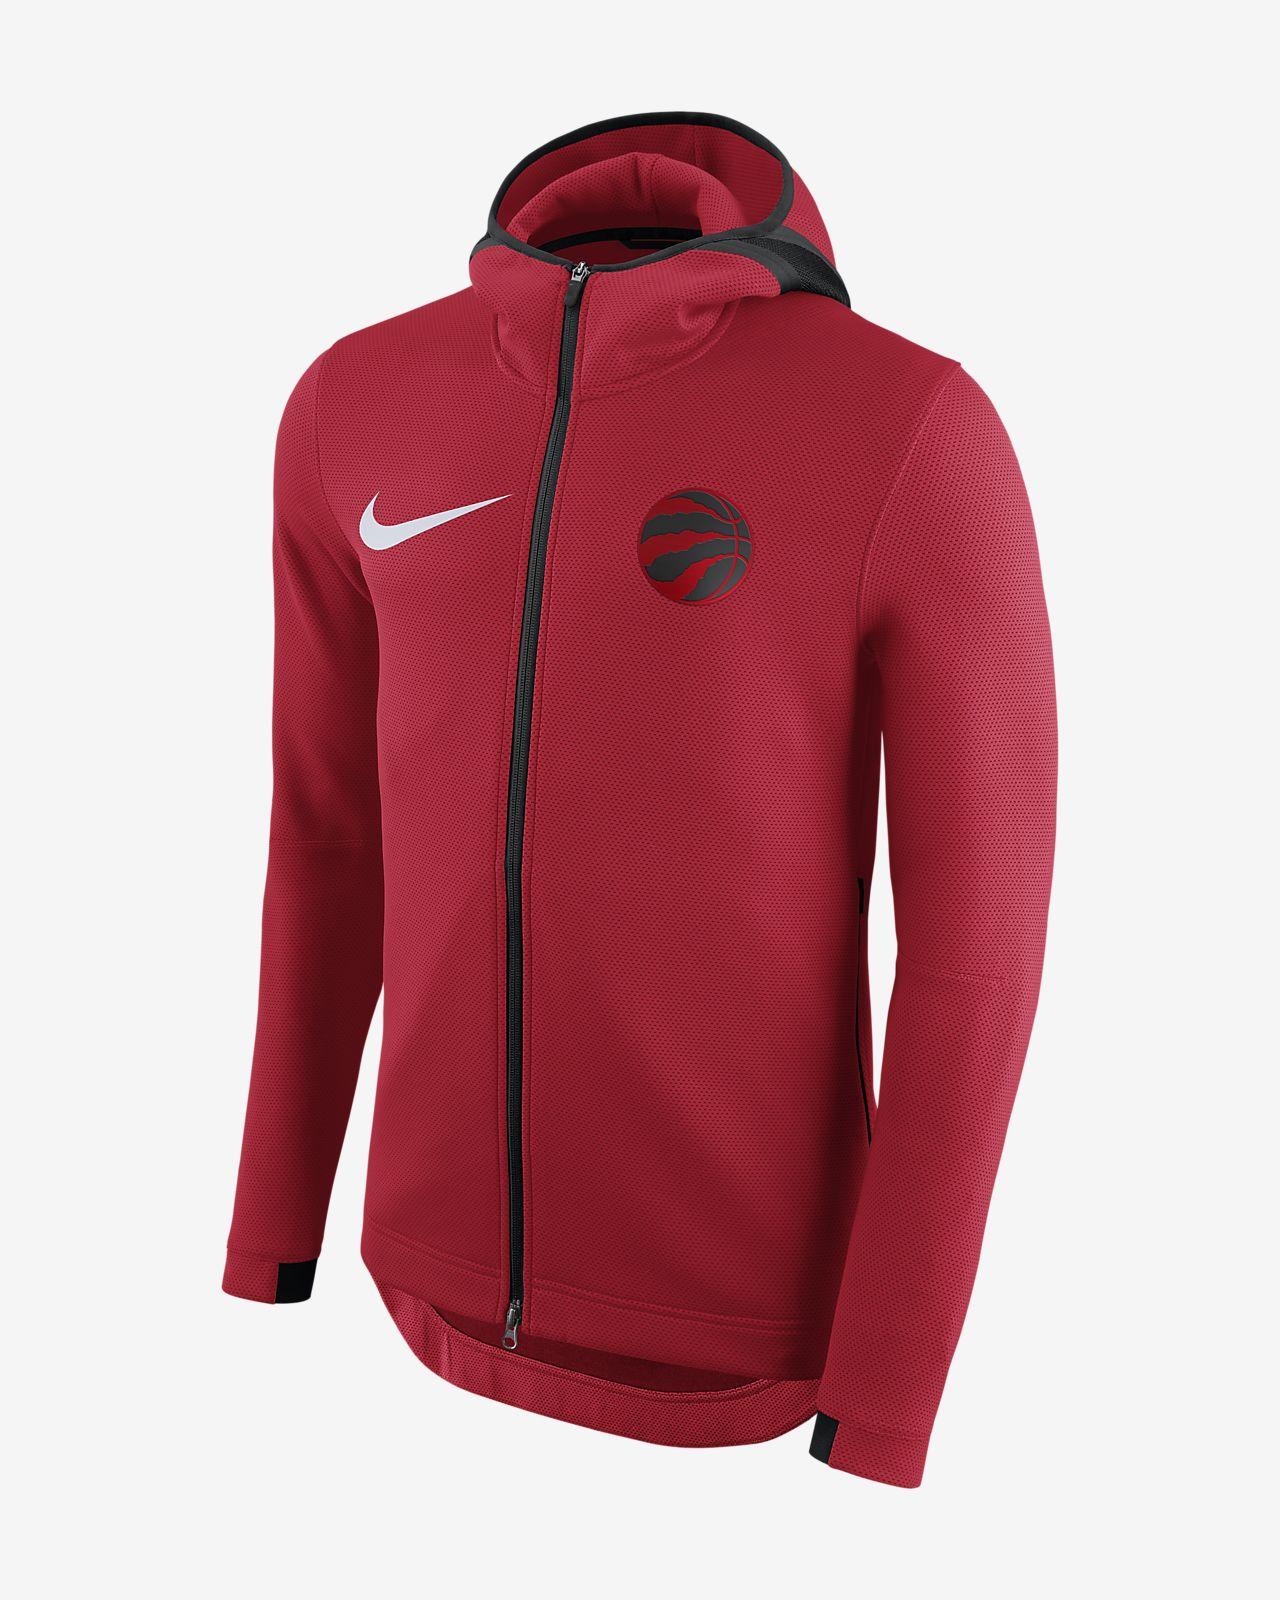 301e497b4 Toronto Raptors Nike Therma Flex Showtime Men's NBA Hoodie. Nike.com